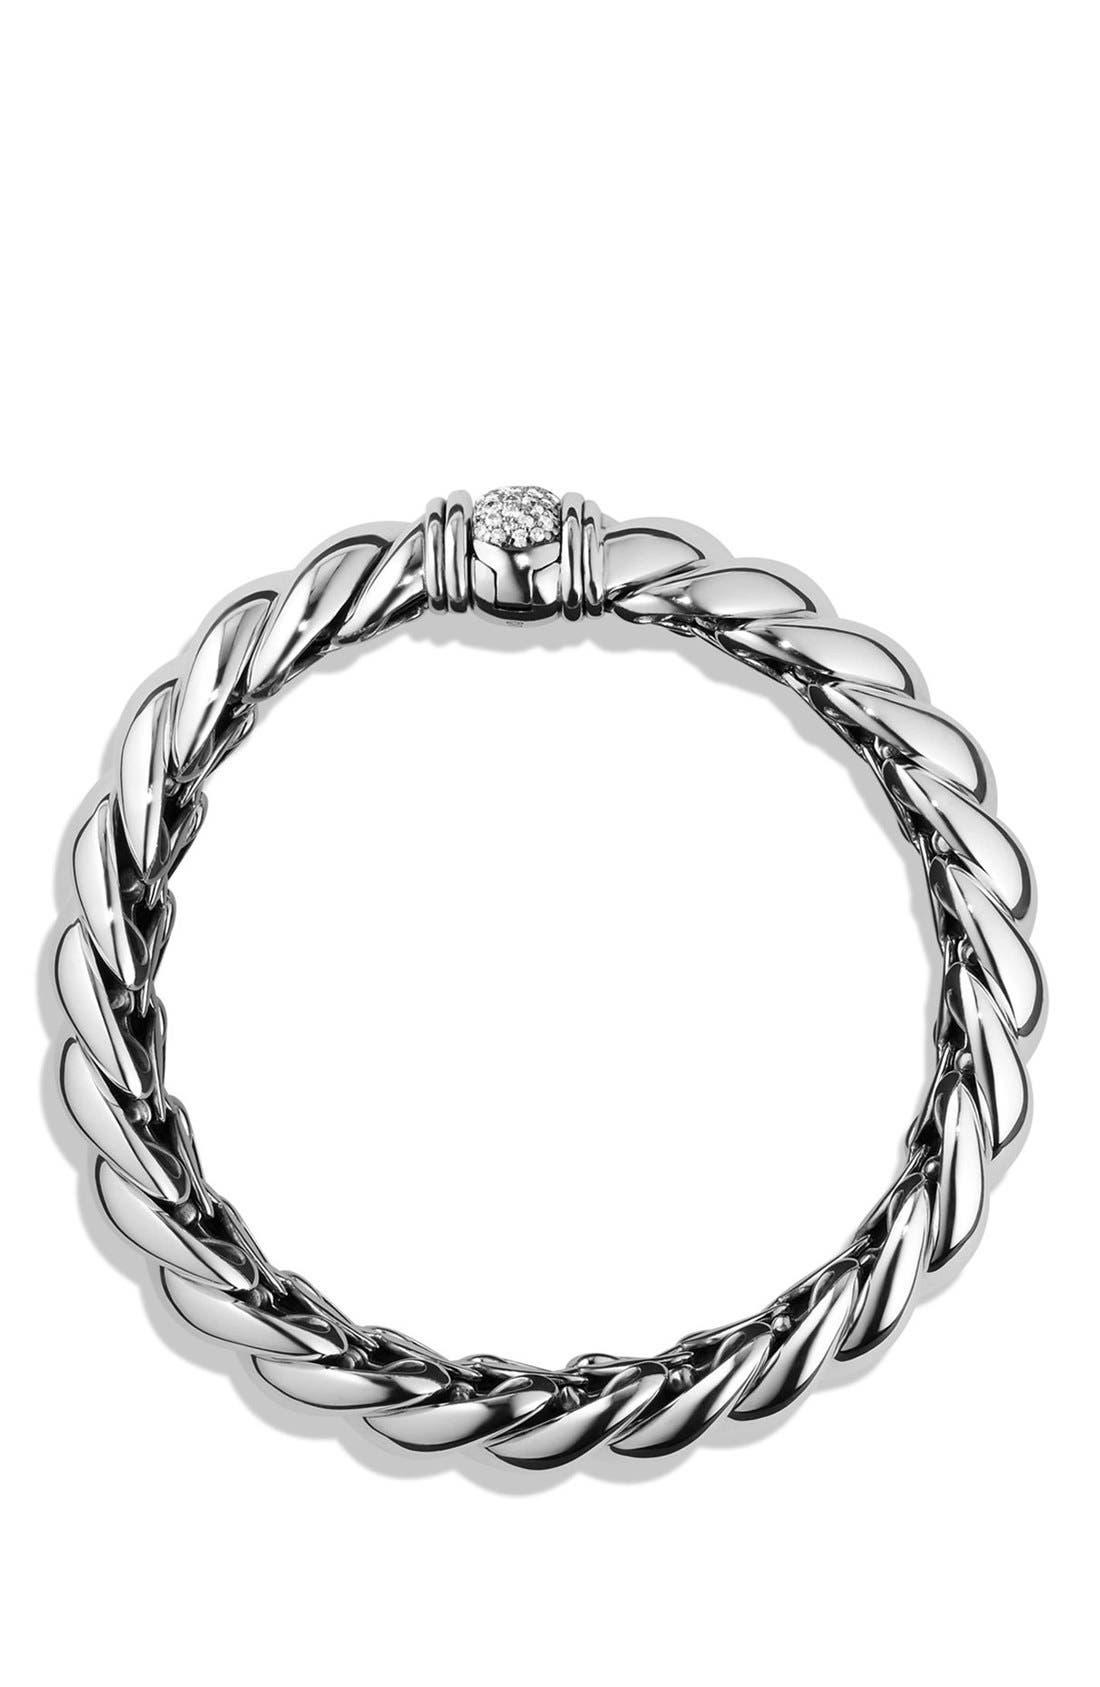 DAVID YURMAN Hampton Bracelet with Diamonds